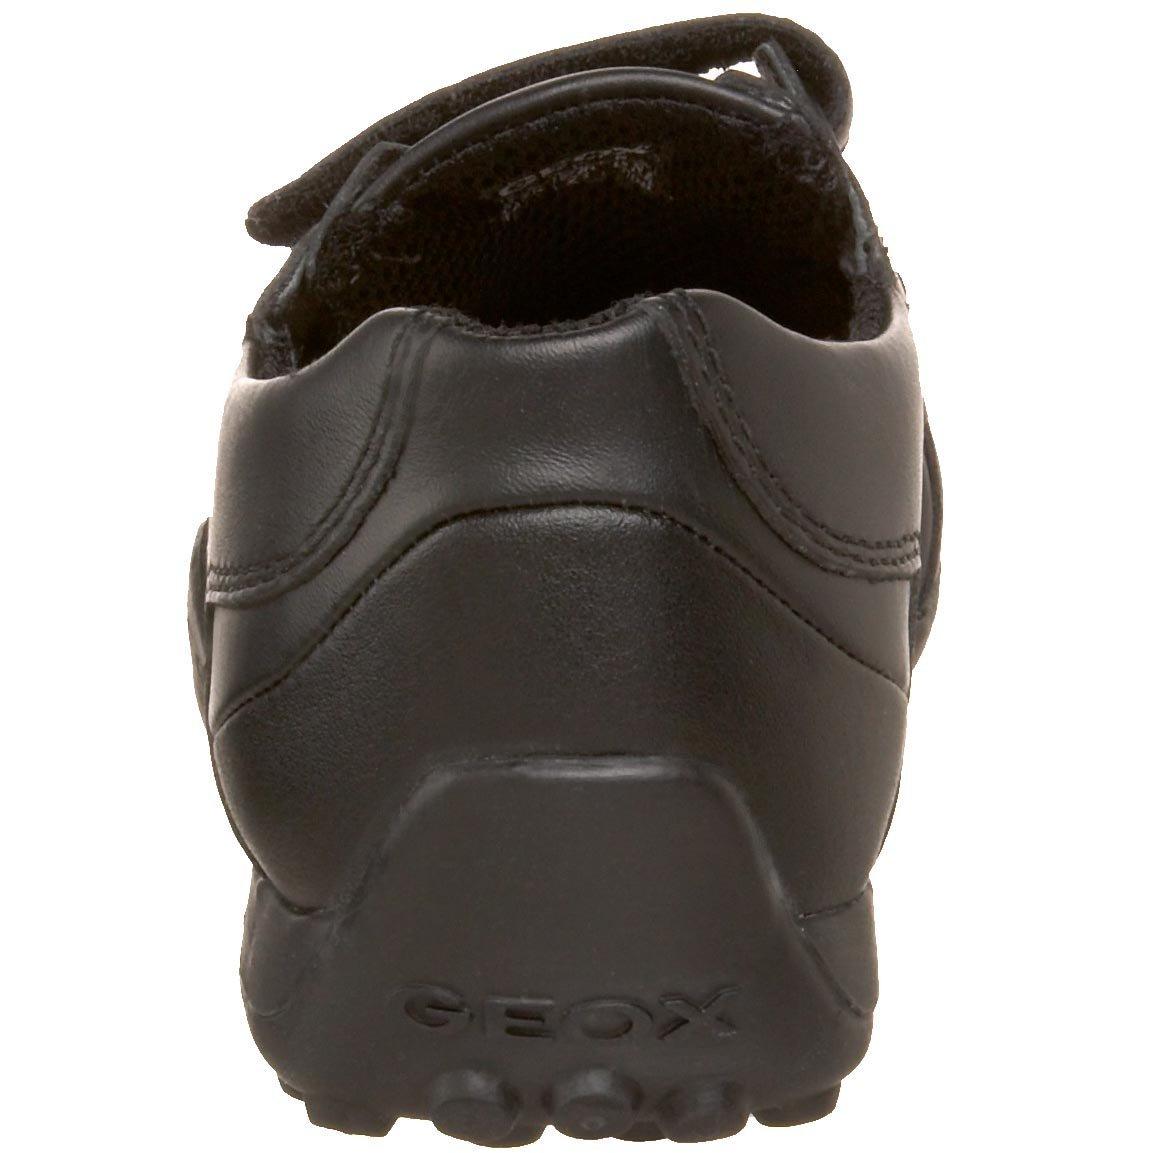 Geox Boy's JR W.SNAKE MOCASSINO Shoe,black,37 M EU Big Kid (5 US) by Geox (Image #2)